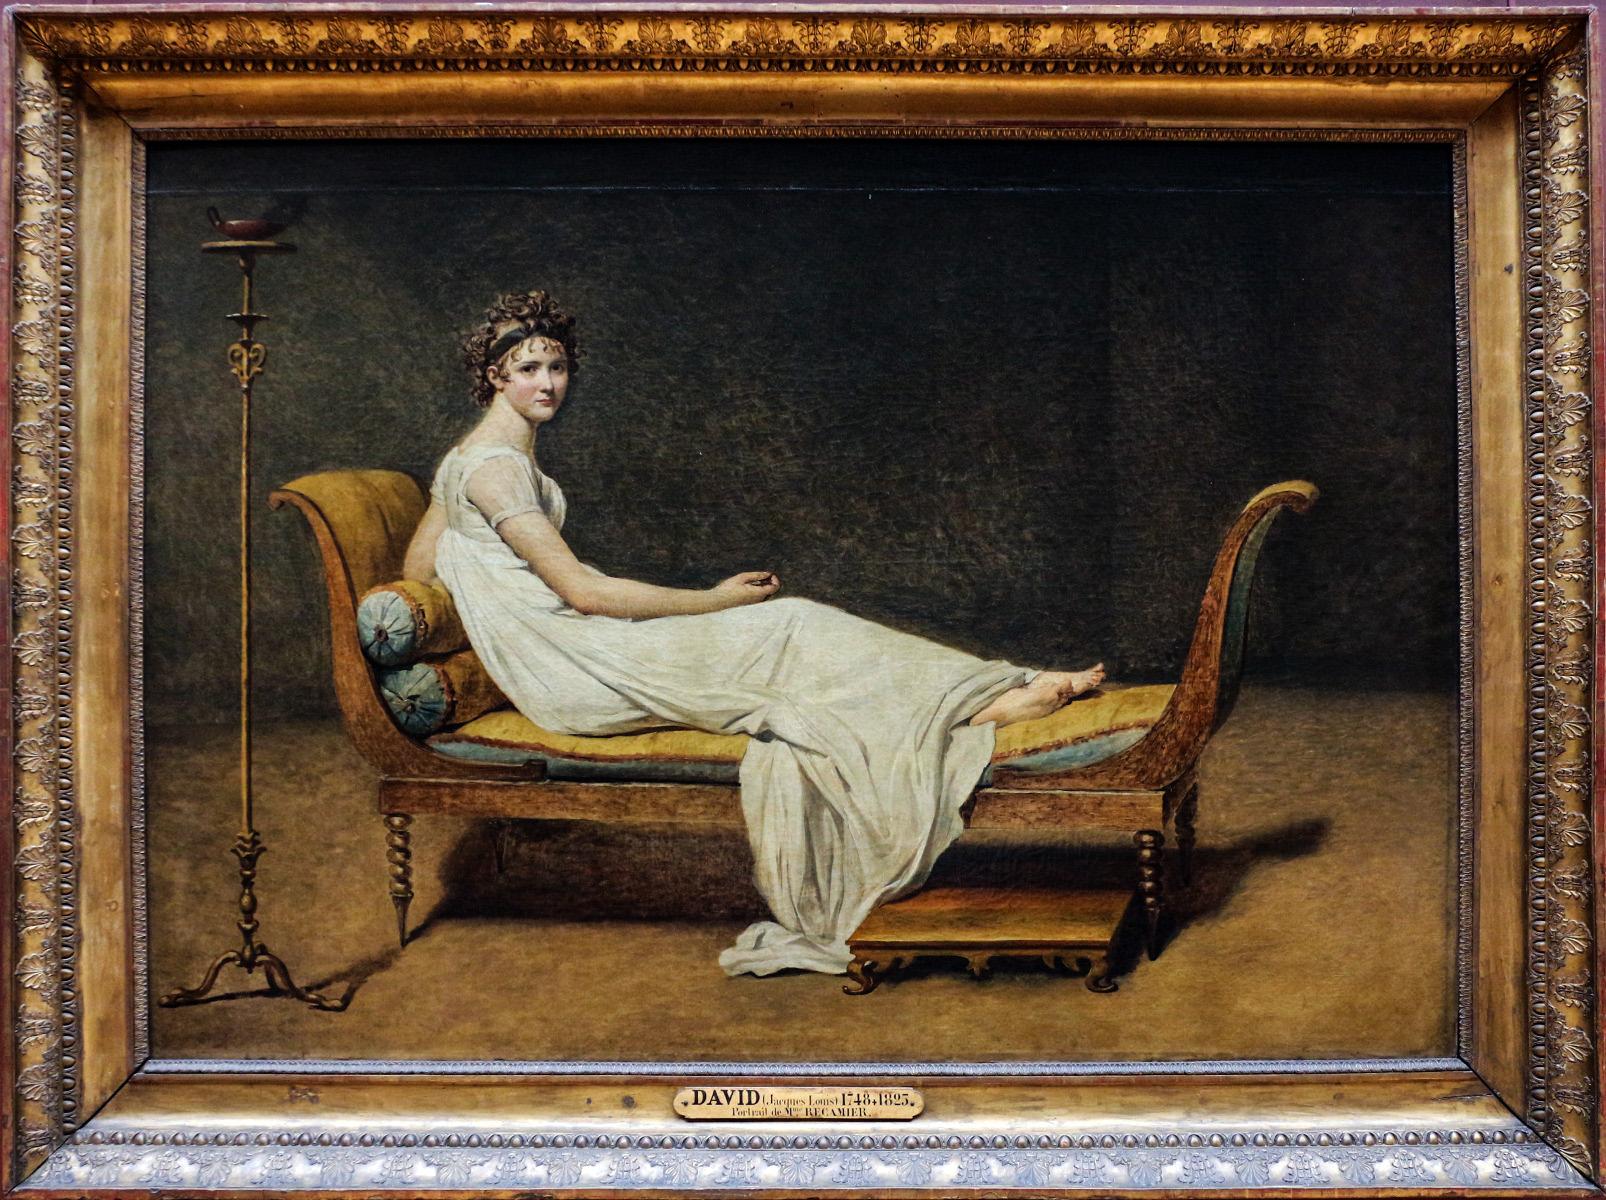 juliette-recamier-3-800x400